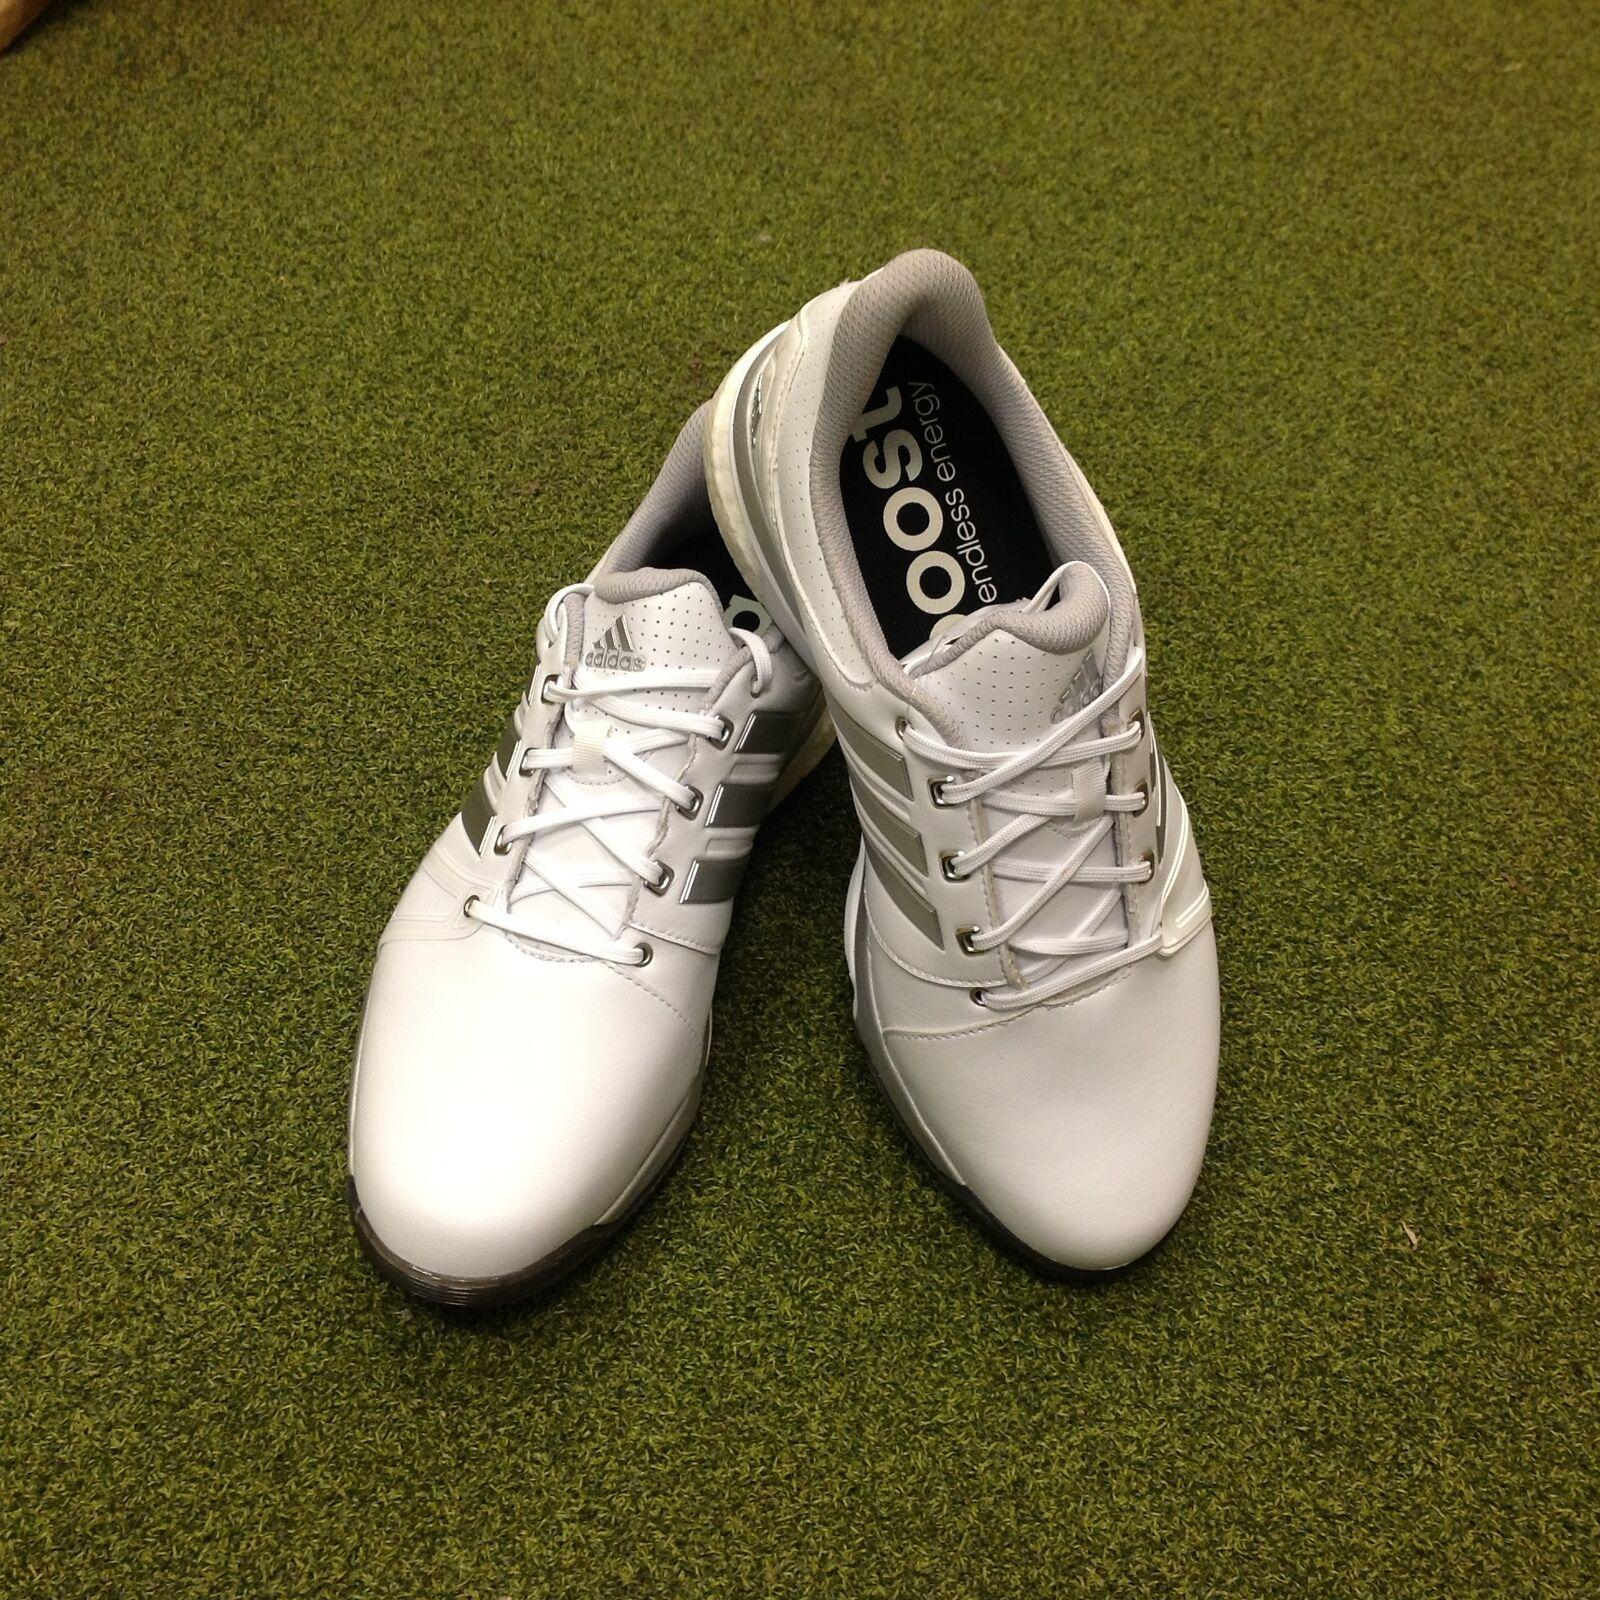 NUOVO Adidas Adipower Boost 2 Scarpe Da Golf-misure US (wide) - US Golf-misure 9-EU 42 2/3 347aec